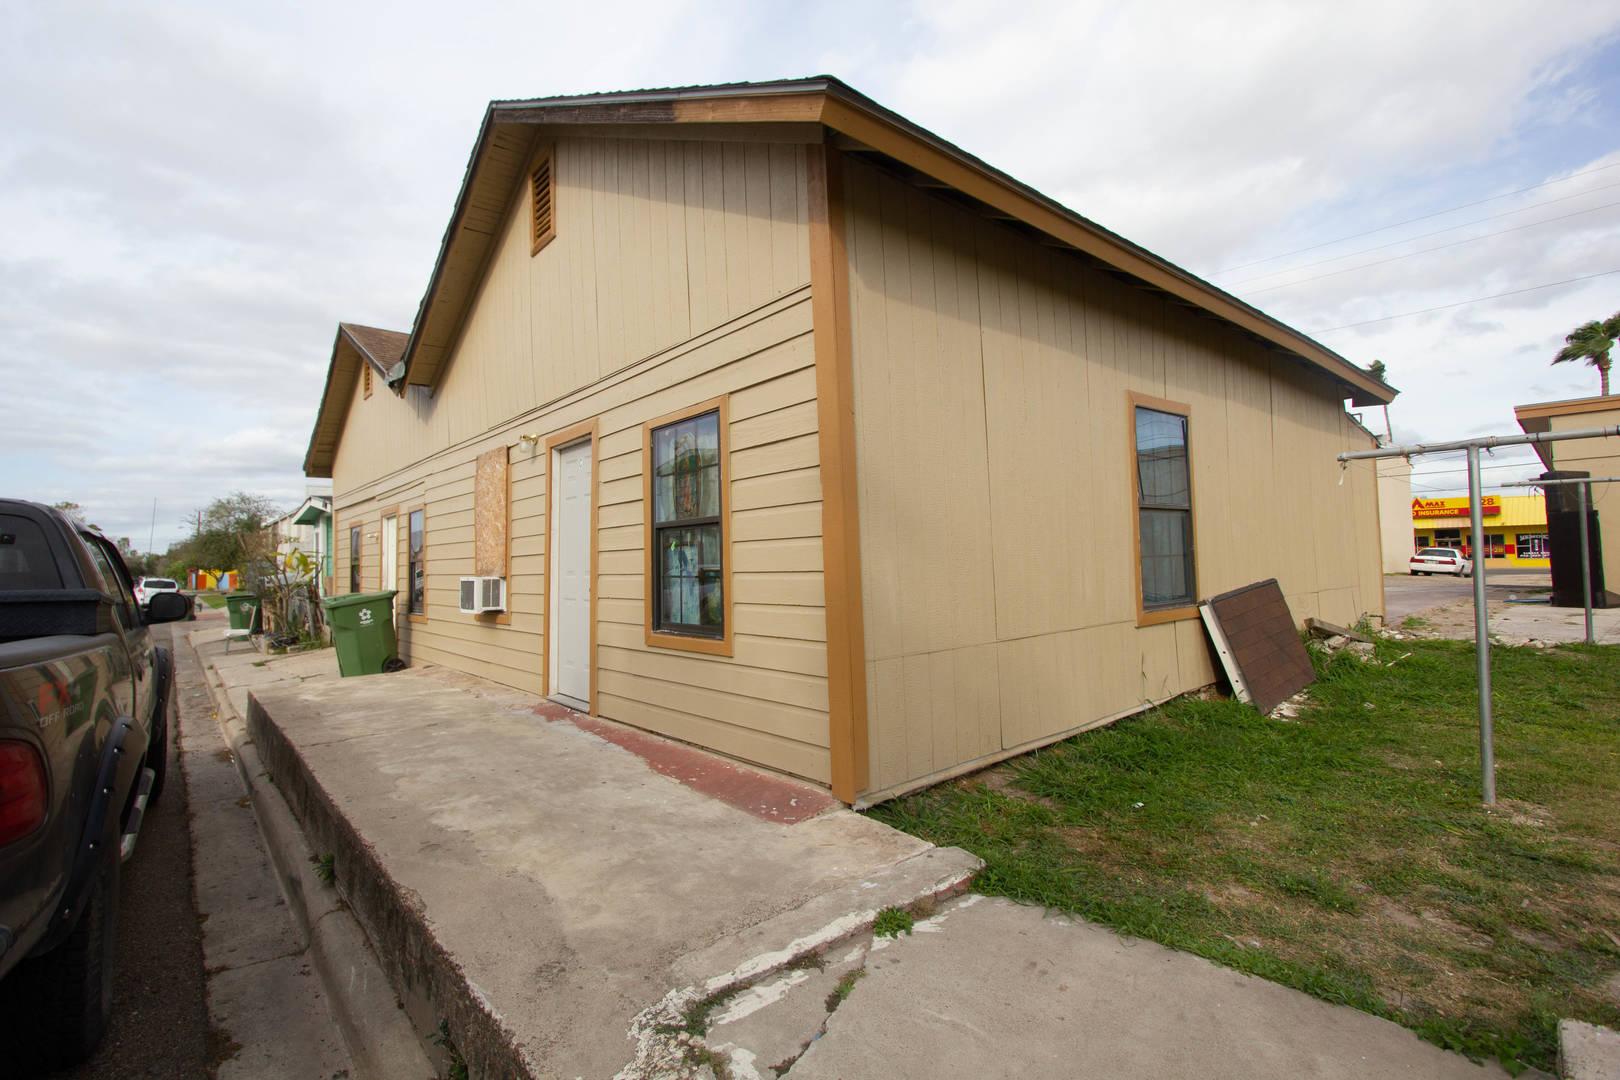 133 N Missouri Avenue Weslaco, TX 78596